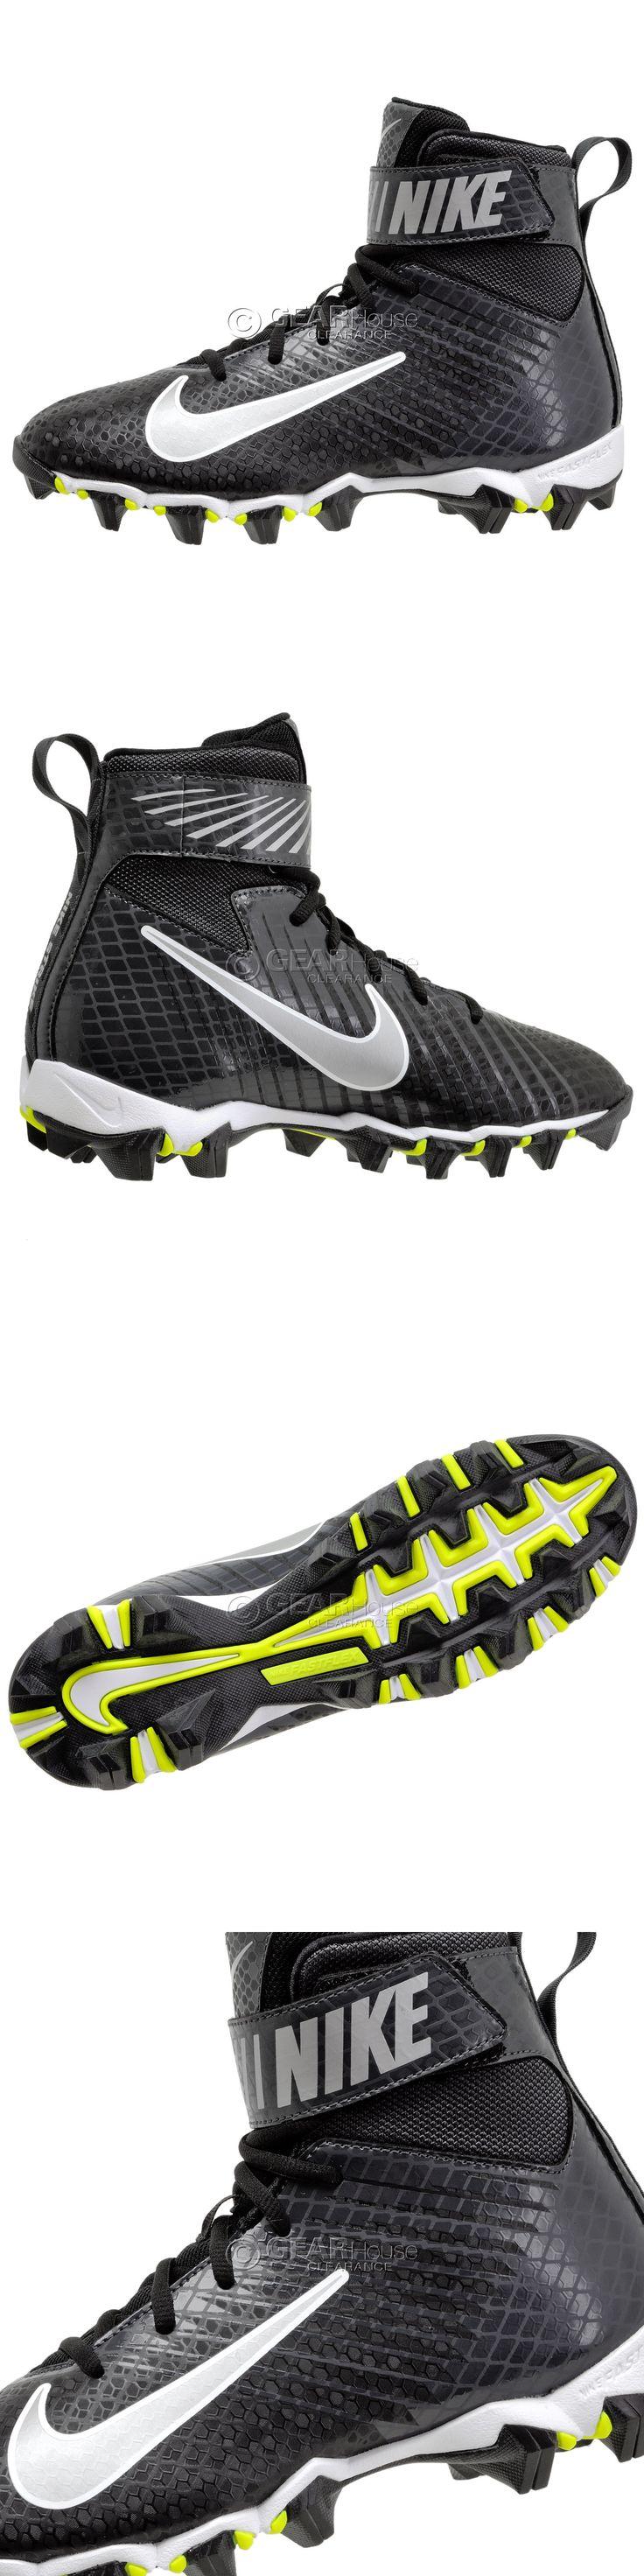 Men 159116: New Nike Strike Shark Mens High Top Football Cleats Lineman : Black Silver -> BUY IT NOW ONLY: $37.8 on eBay!